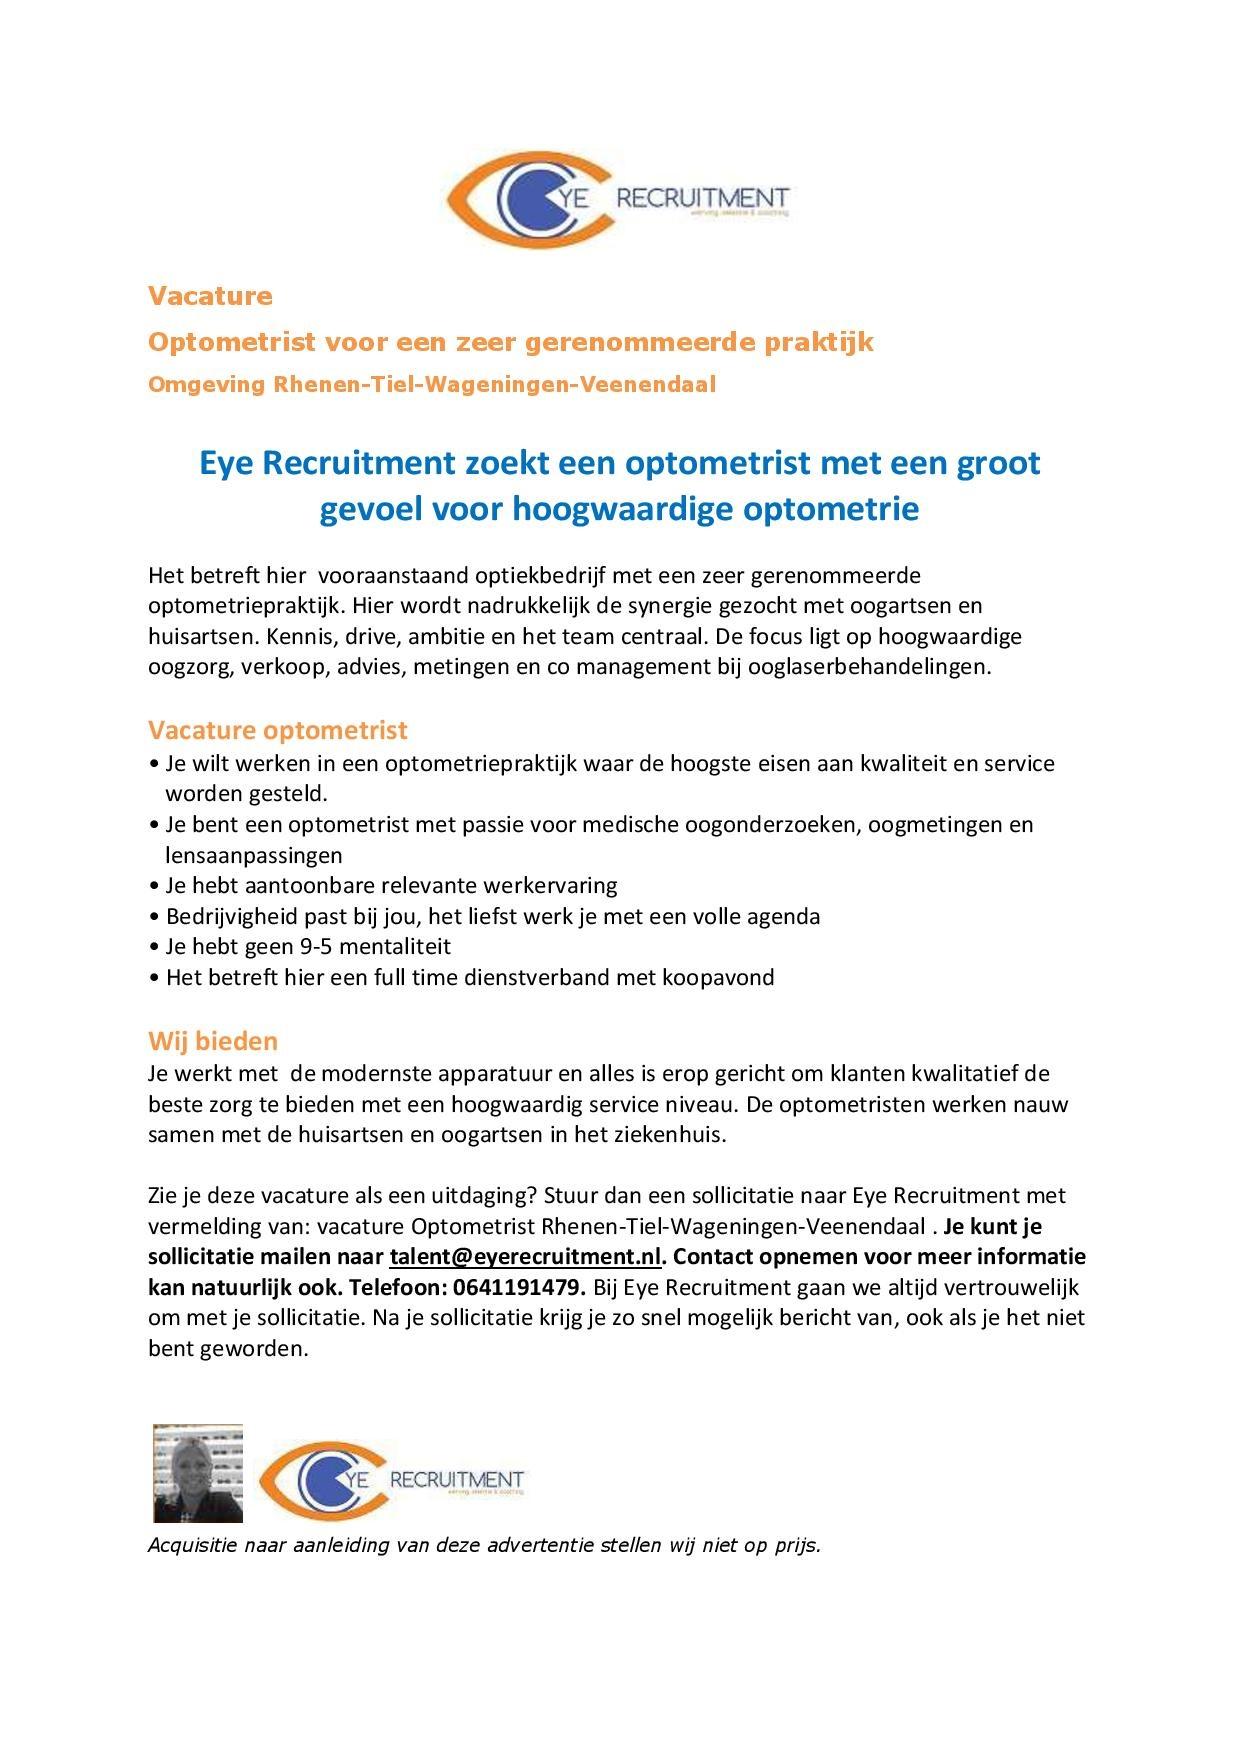 advertentie-tekst-vacature-damme-optiek-optometrist-nieuw-page-001